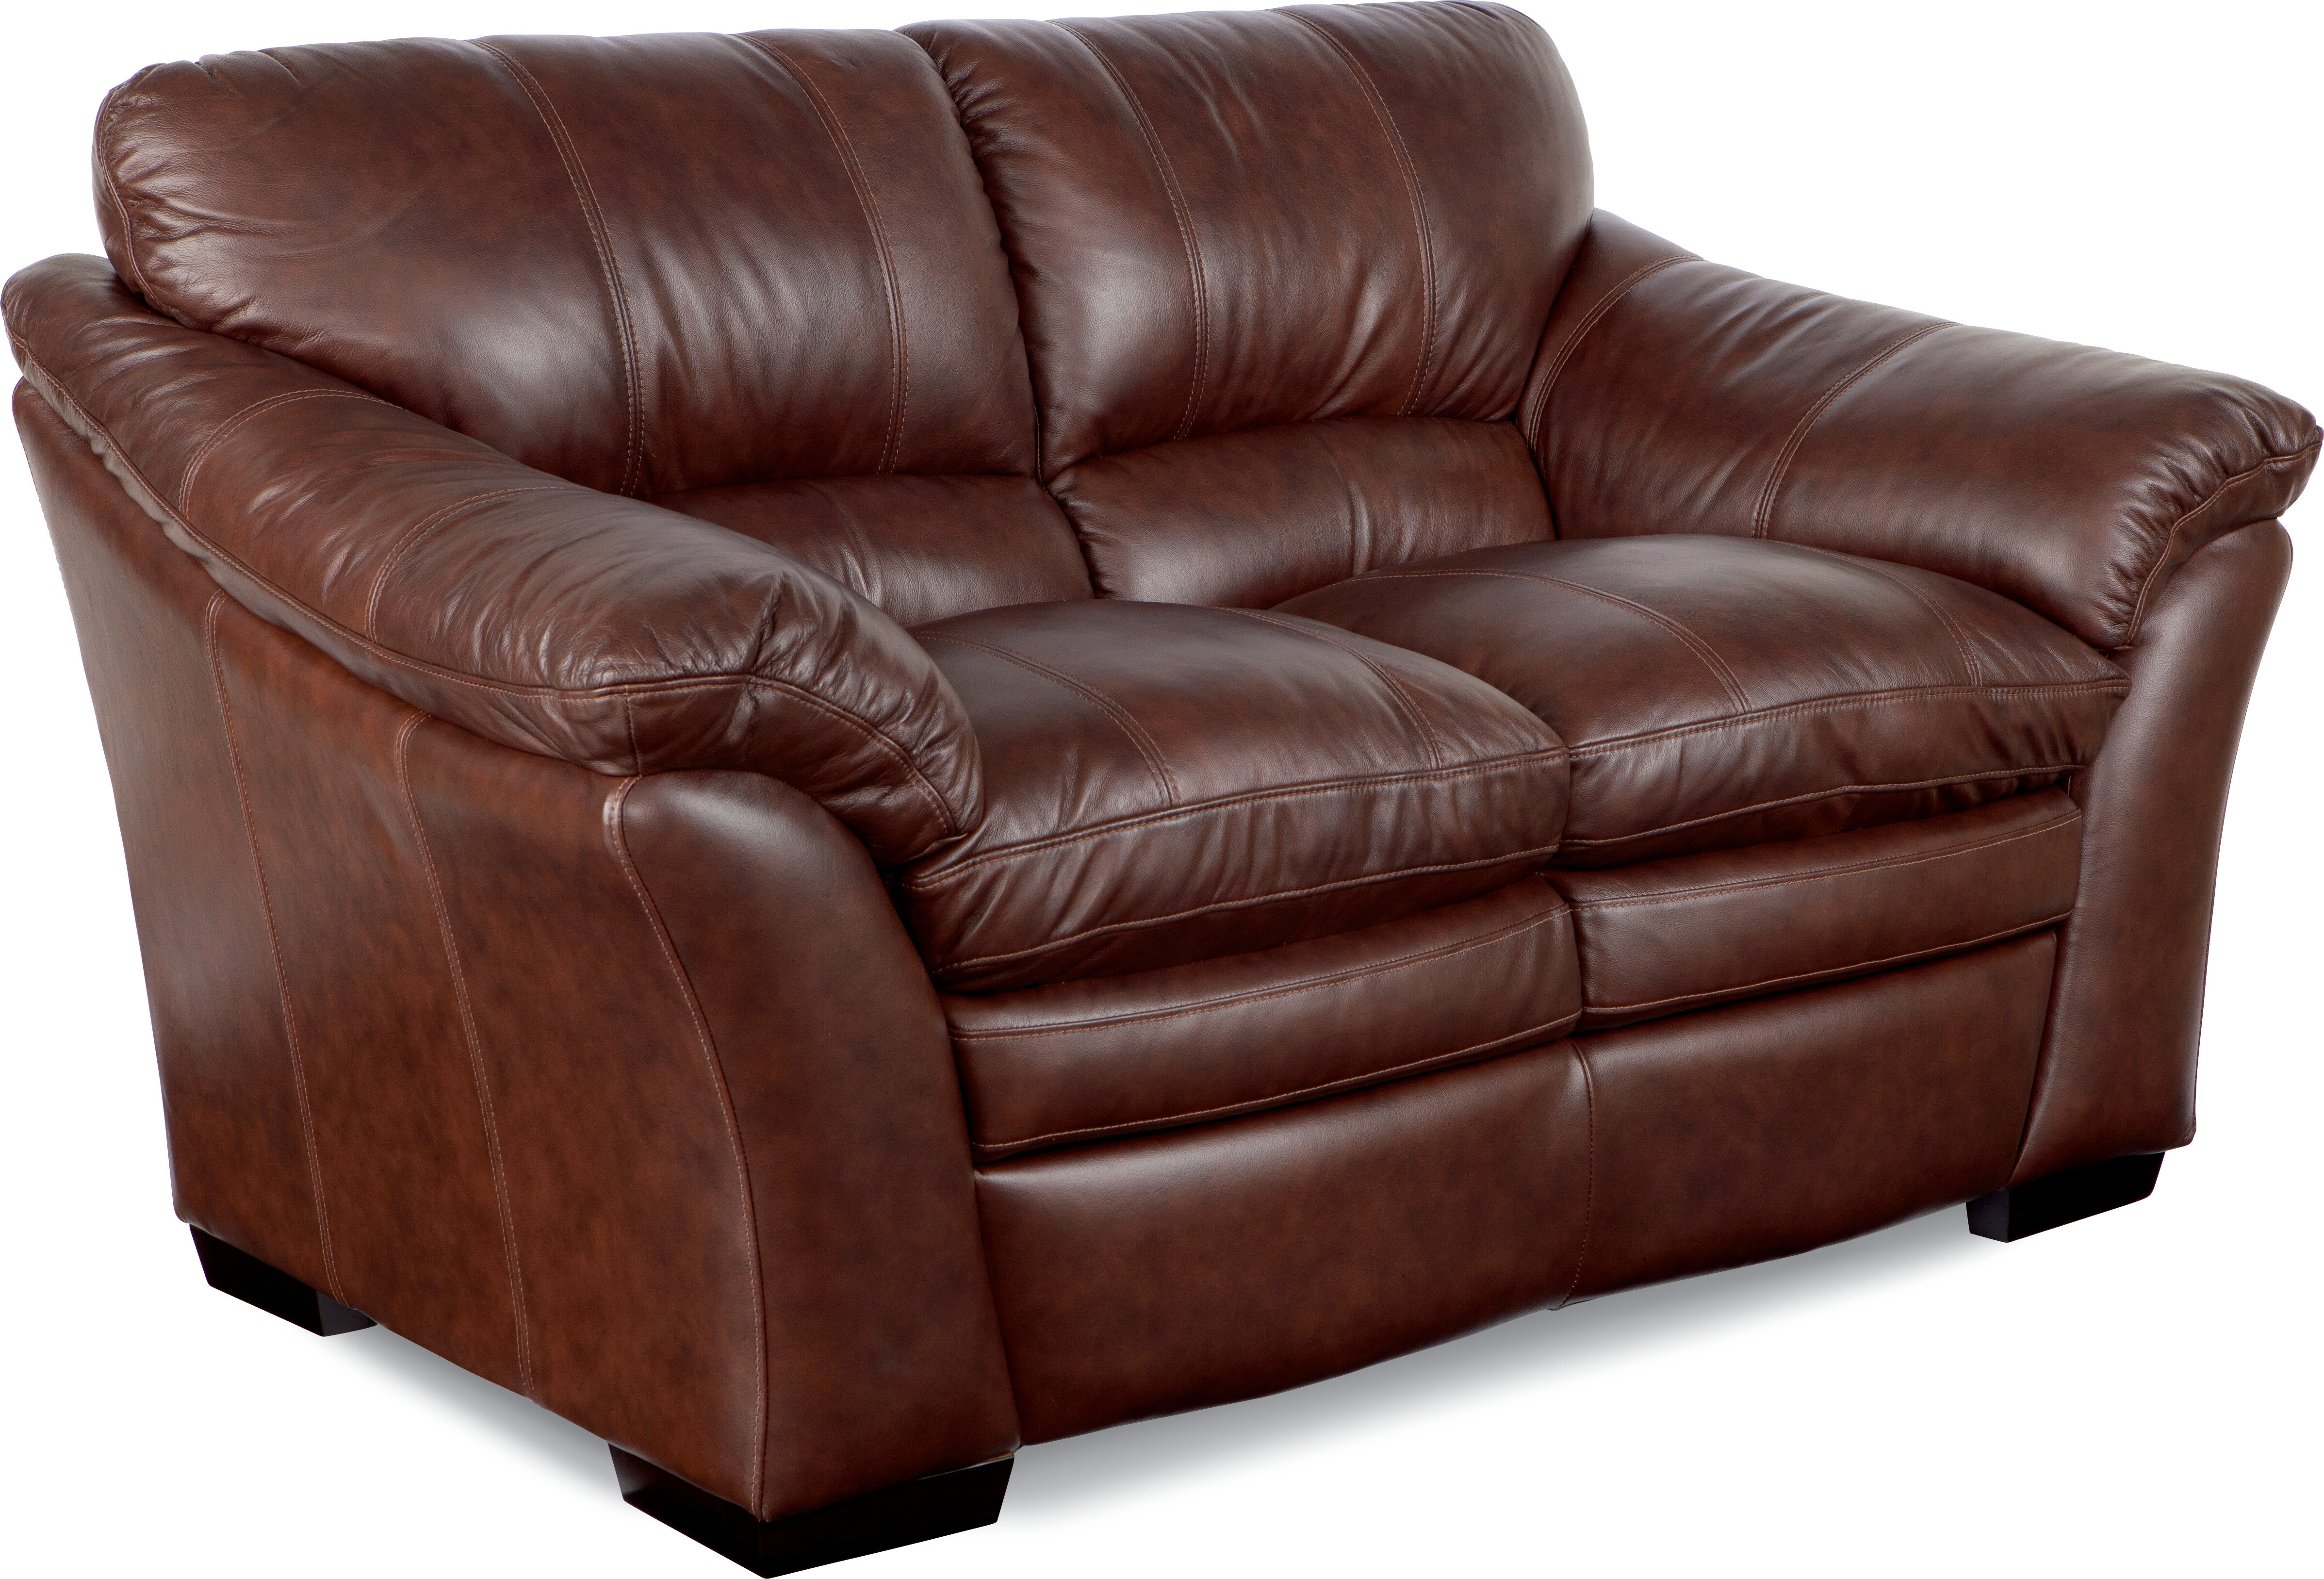 sw syble set loveseat furniture products sq jennifer sofa bbda room living mahogany tan